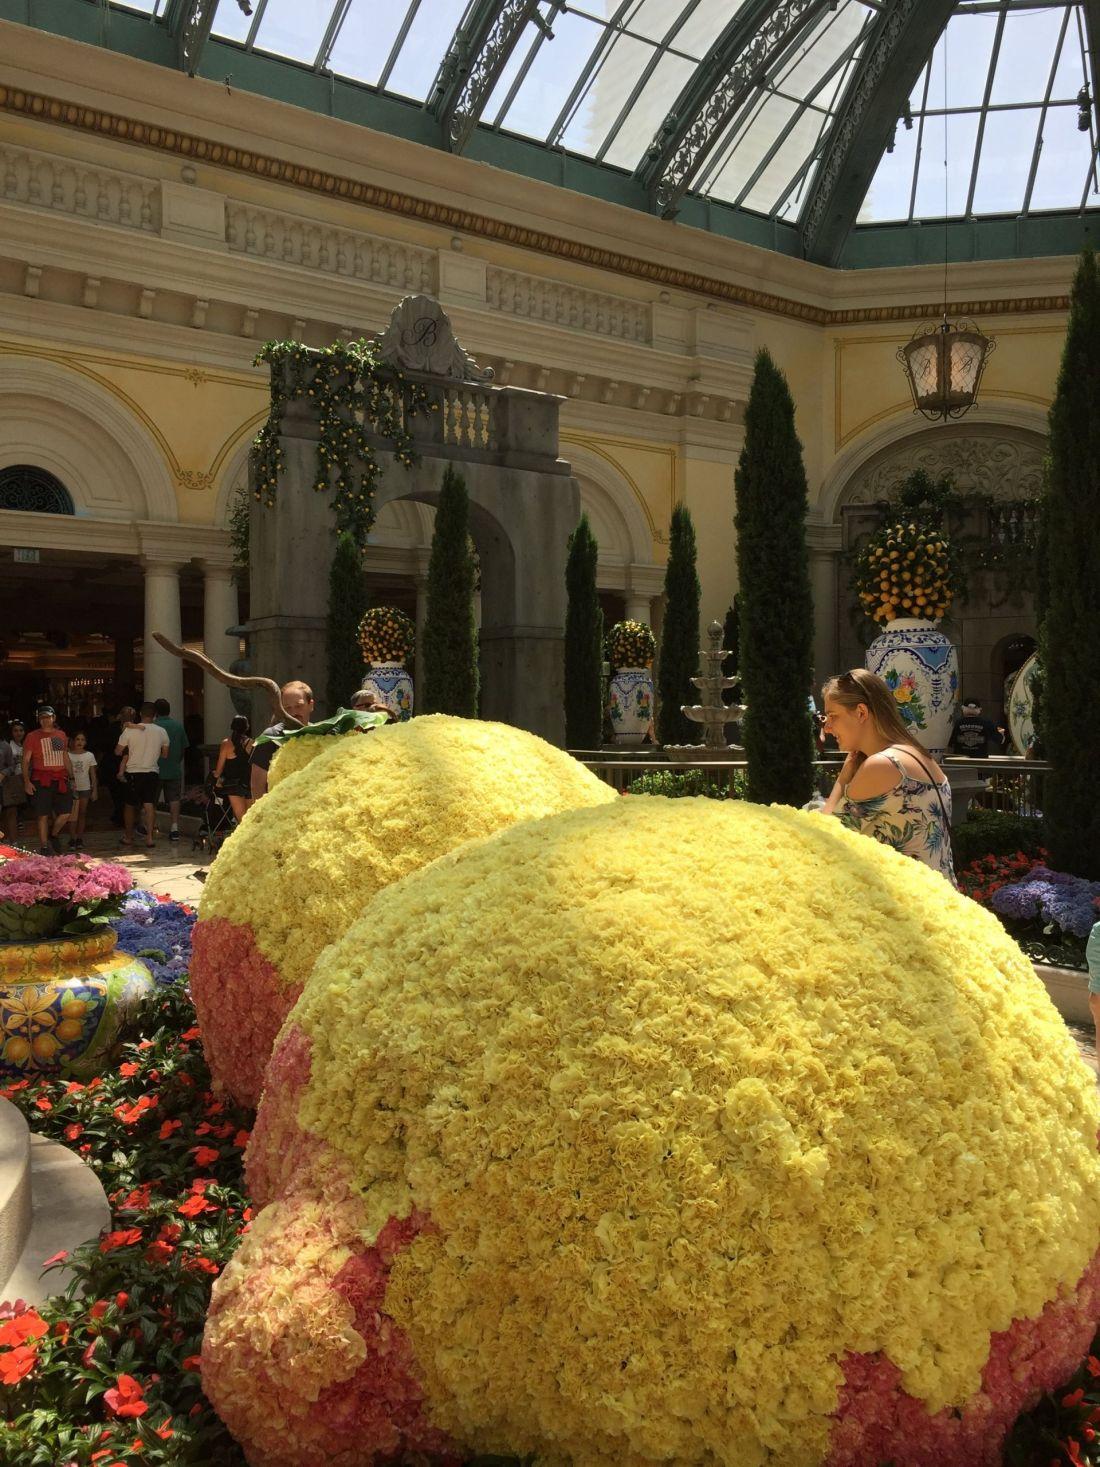 Bellagio Gardens, Las Vegas